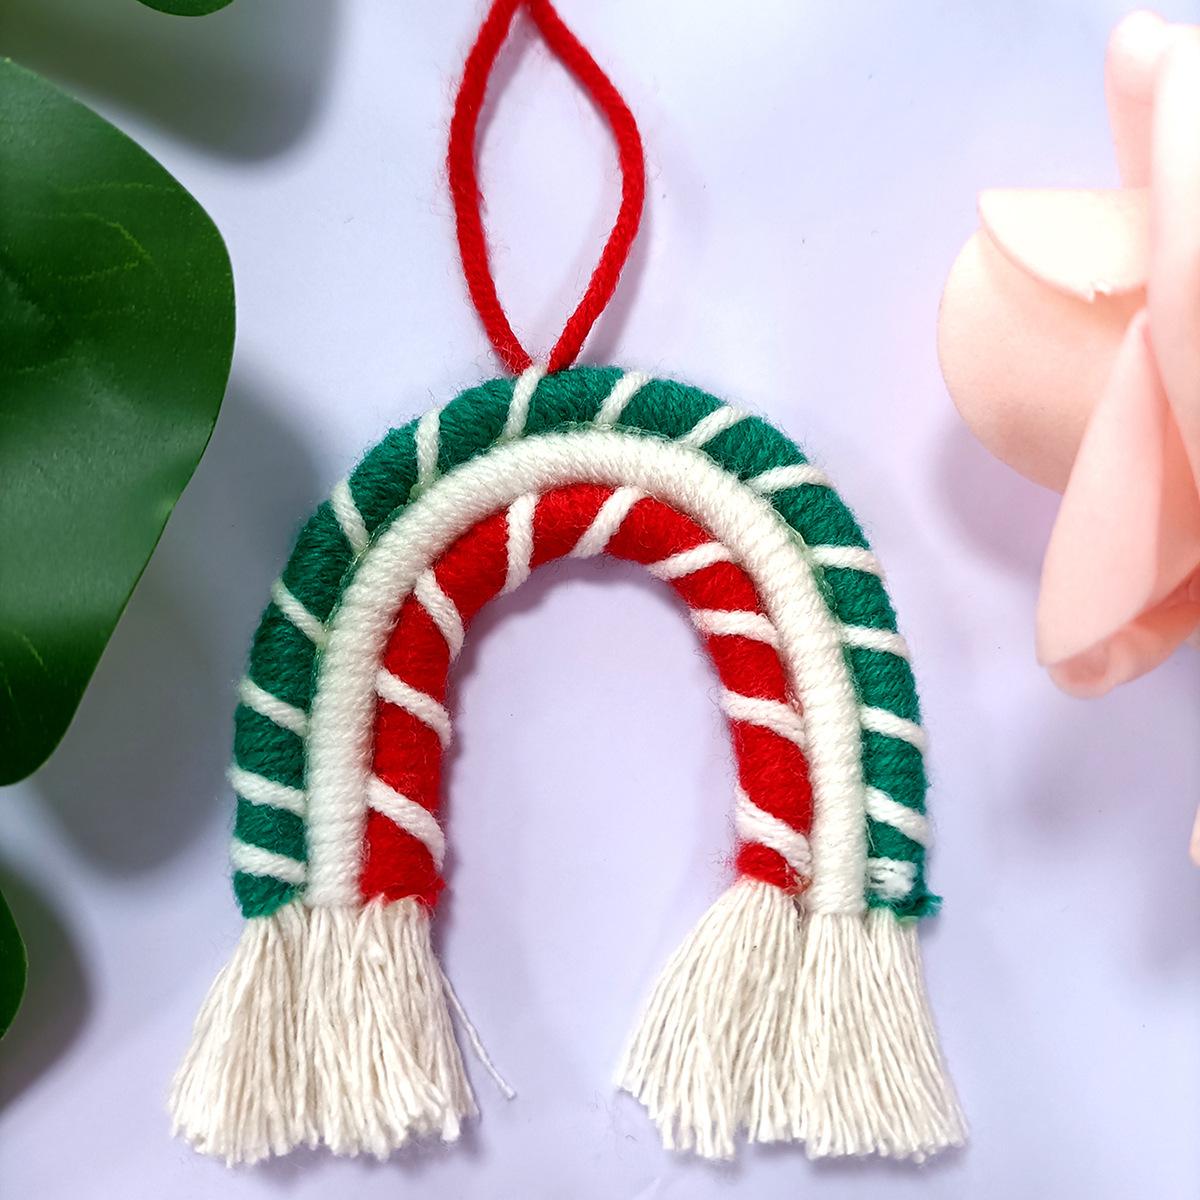 Christmas Rainbow Ornaments Christmas Tree Pendant For Household Decoration C06